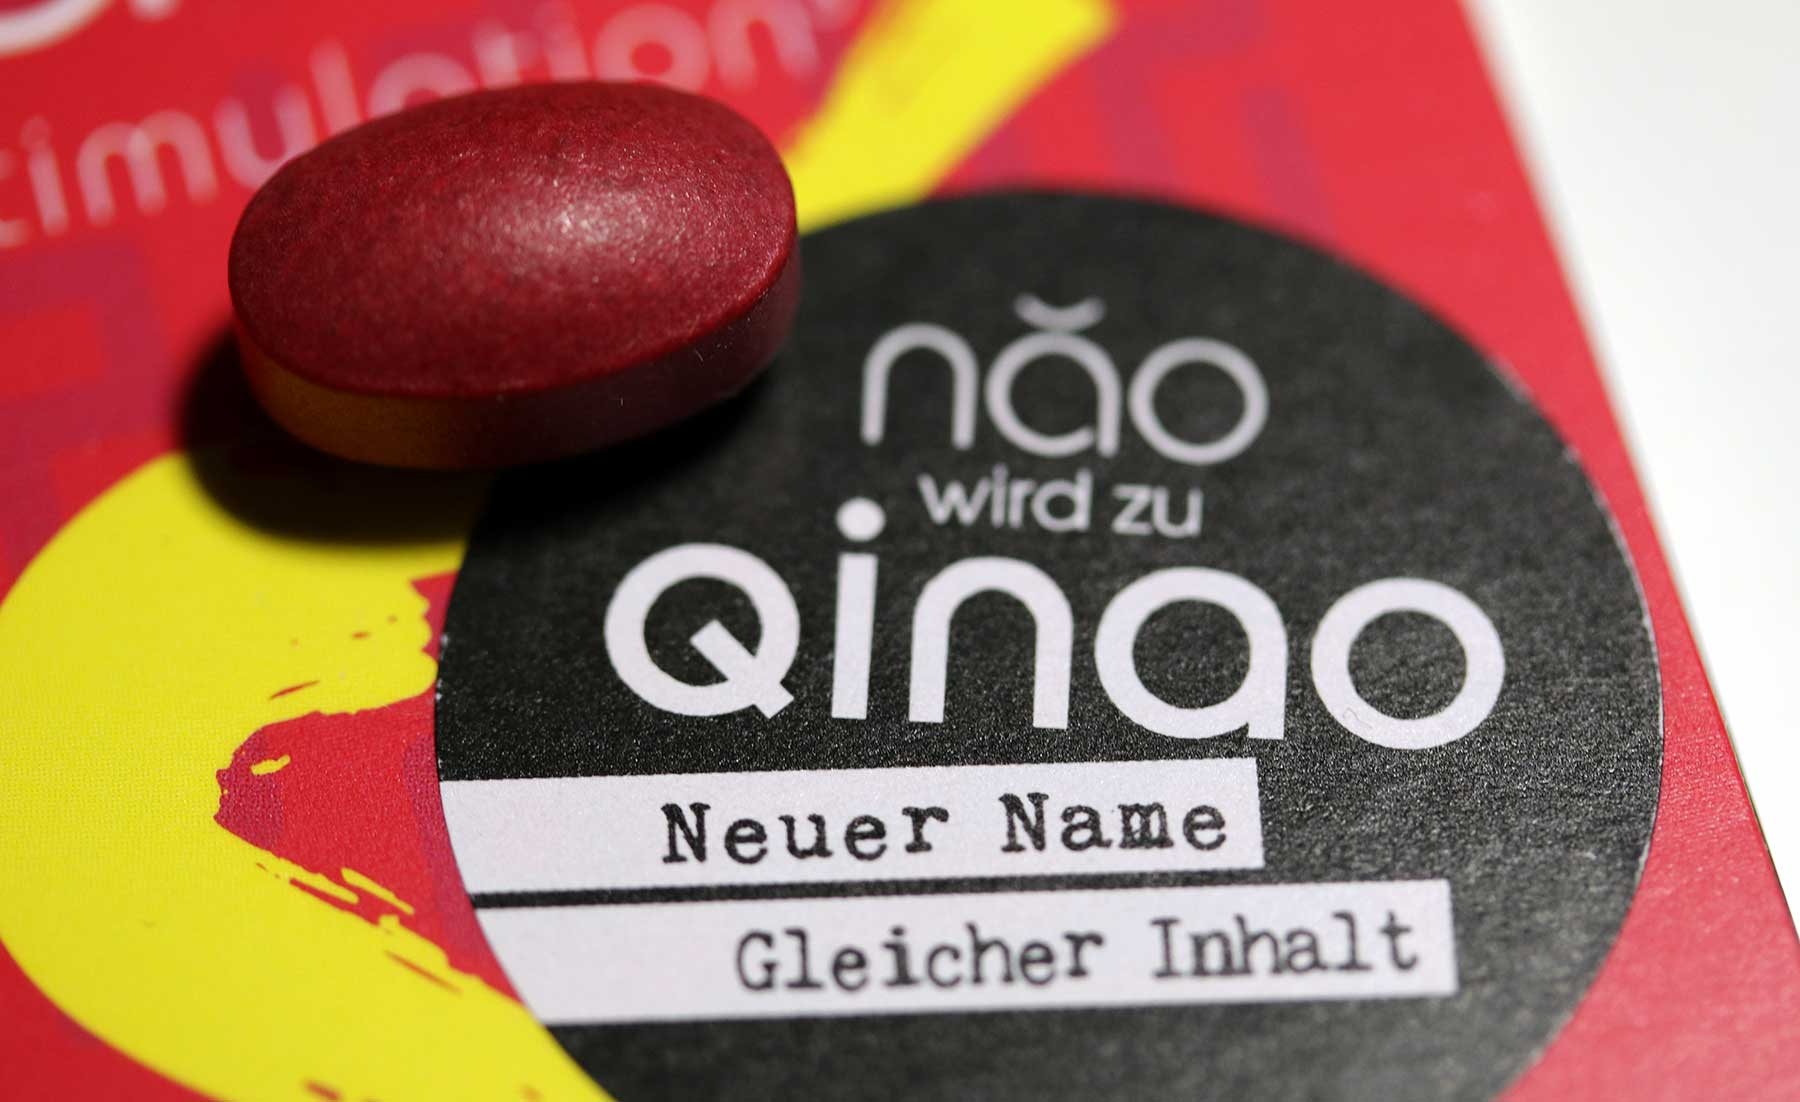 Mein persönlicher Jahresrückblick: 2020 (powered by Qinao / nao brain stimulation) Qinao_2020-Rueckblick_02